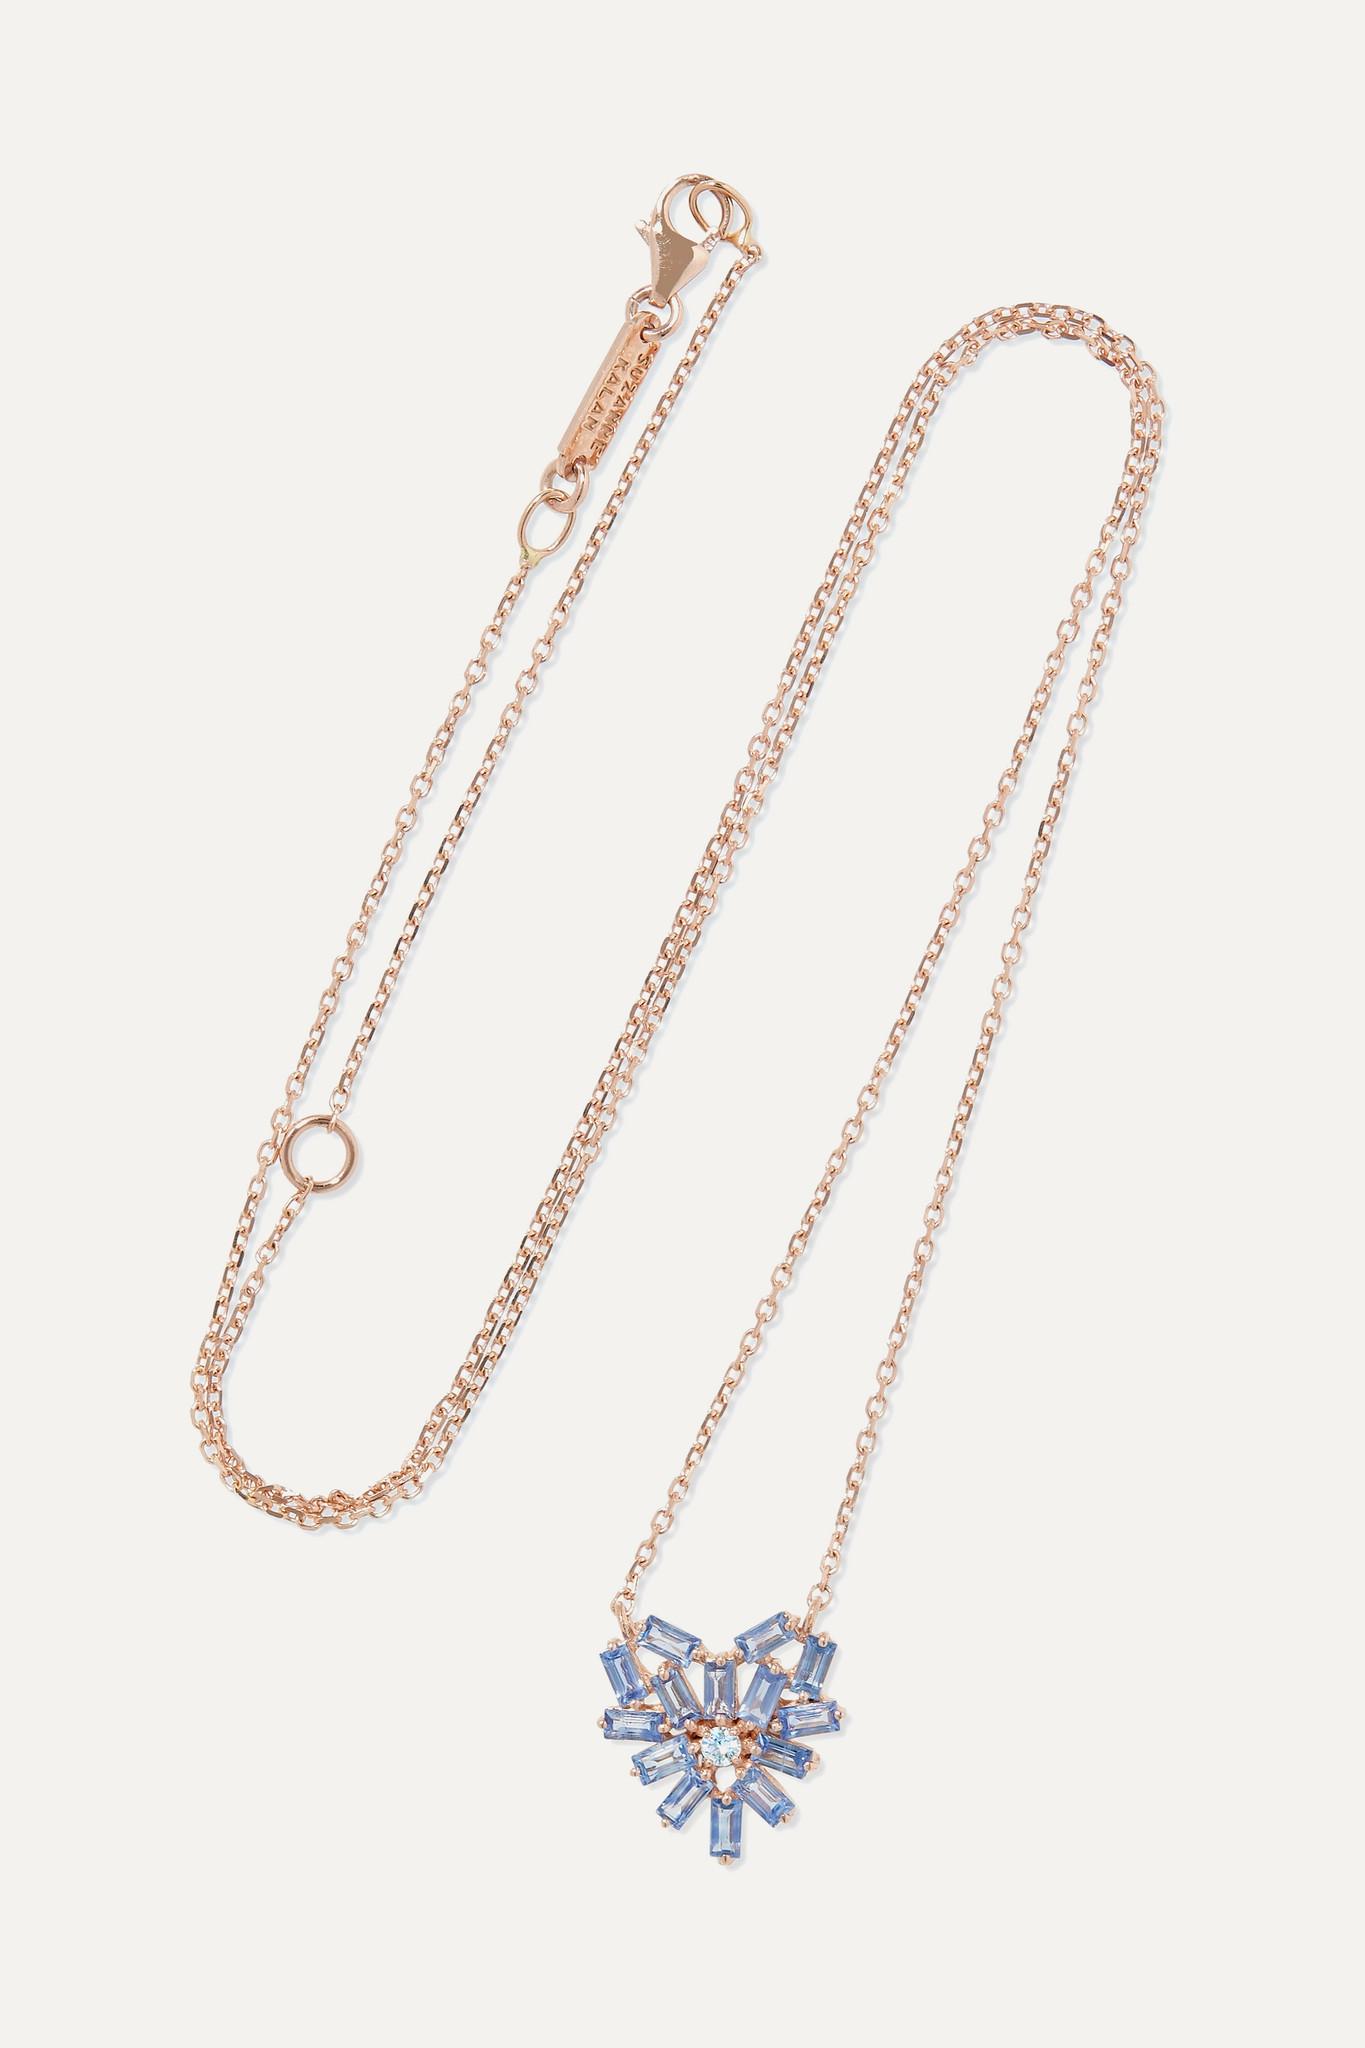 SUZANNE KALAN - 18-karat Rose Gold, Sapphire And Diamond Necklace - one size